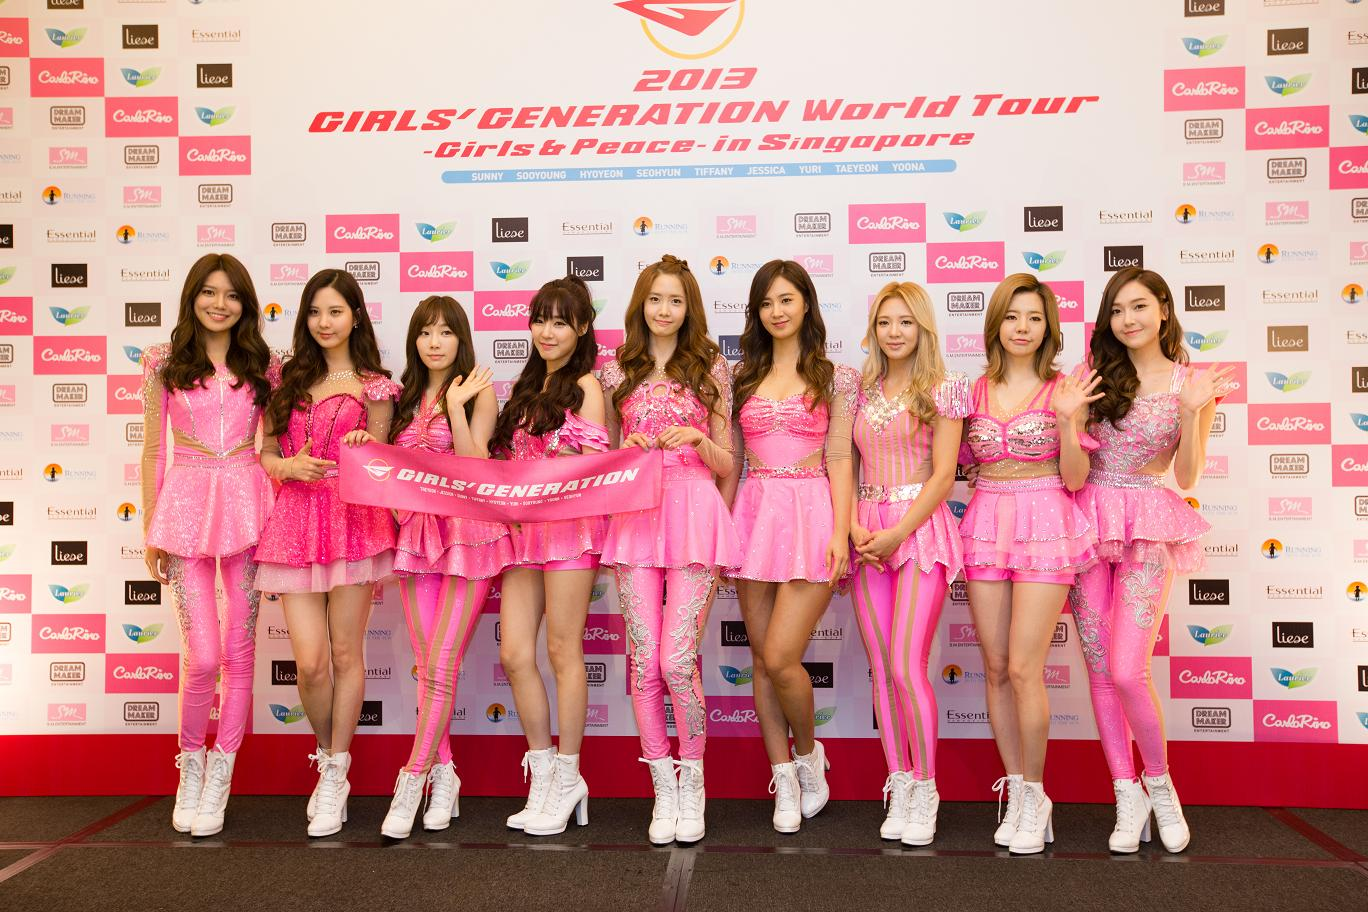 _L-R- Soo Young, Seohyun, Taeyeon, Tiffany, LindaYoona, Yuri, Hyoyeon, Sunny, Jessica